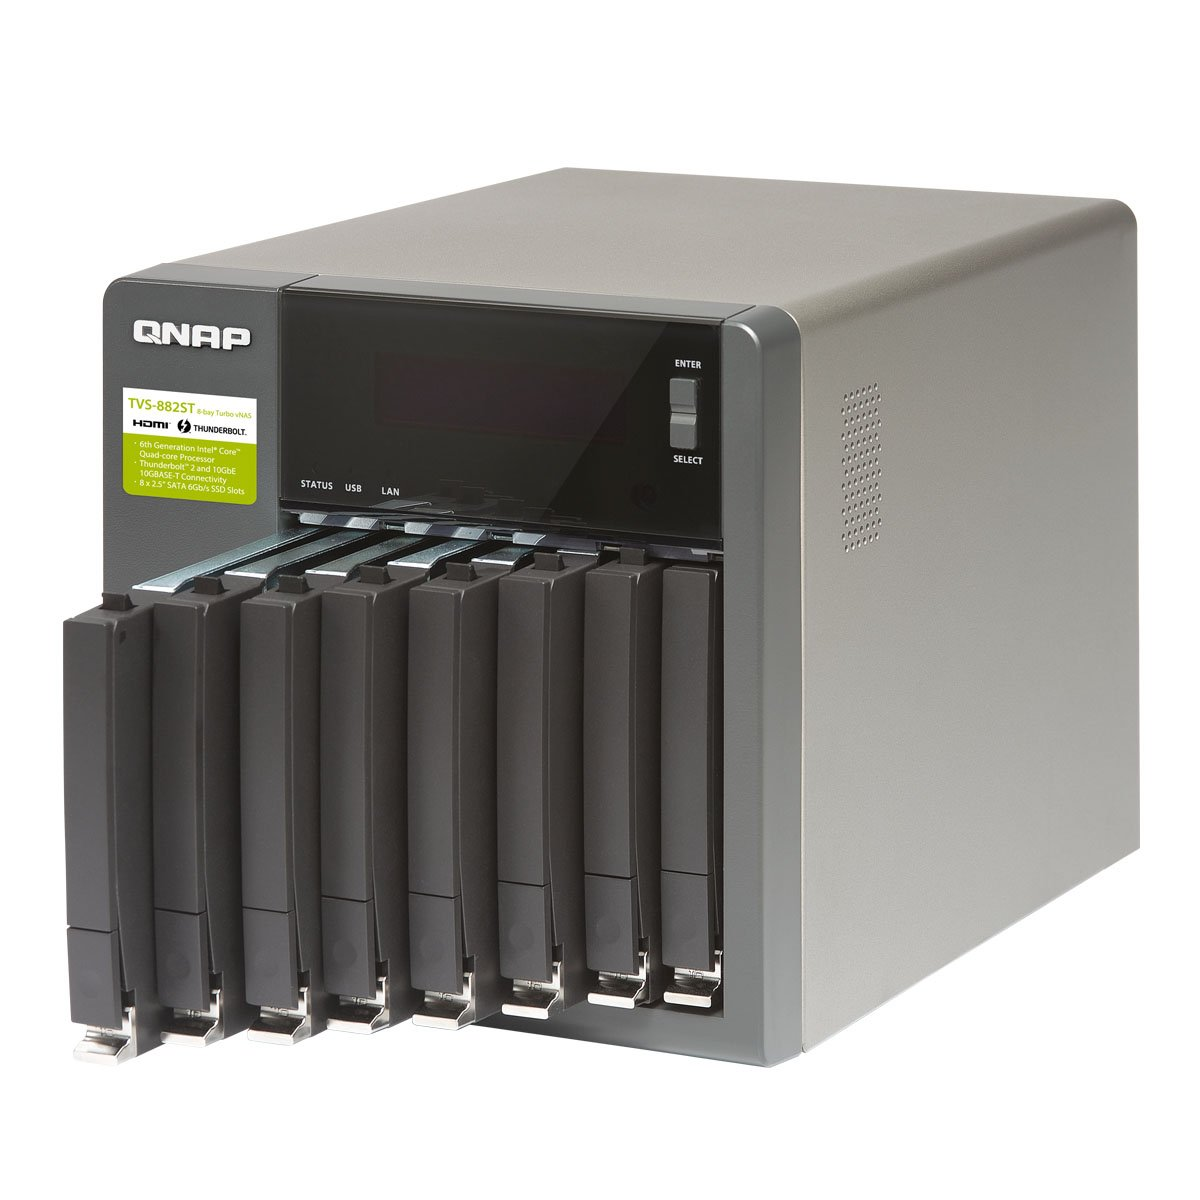 Qnap TVS-882ST2-i5-8G-US High Performance and Compact 8 bay Thunderbolt 2 DAS/NAS/iSCSI IP-SAN Solution by QNAP (Image #2)